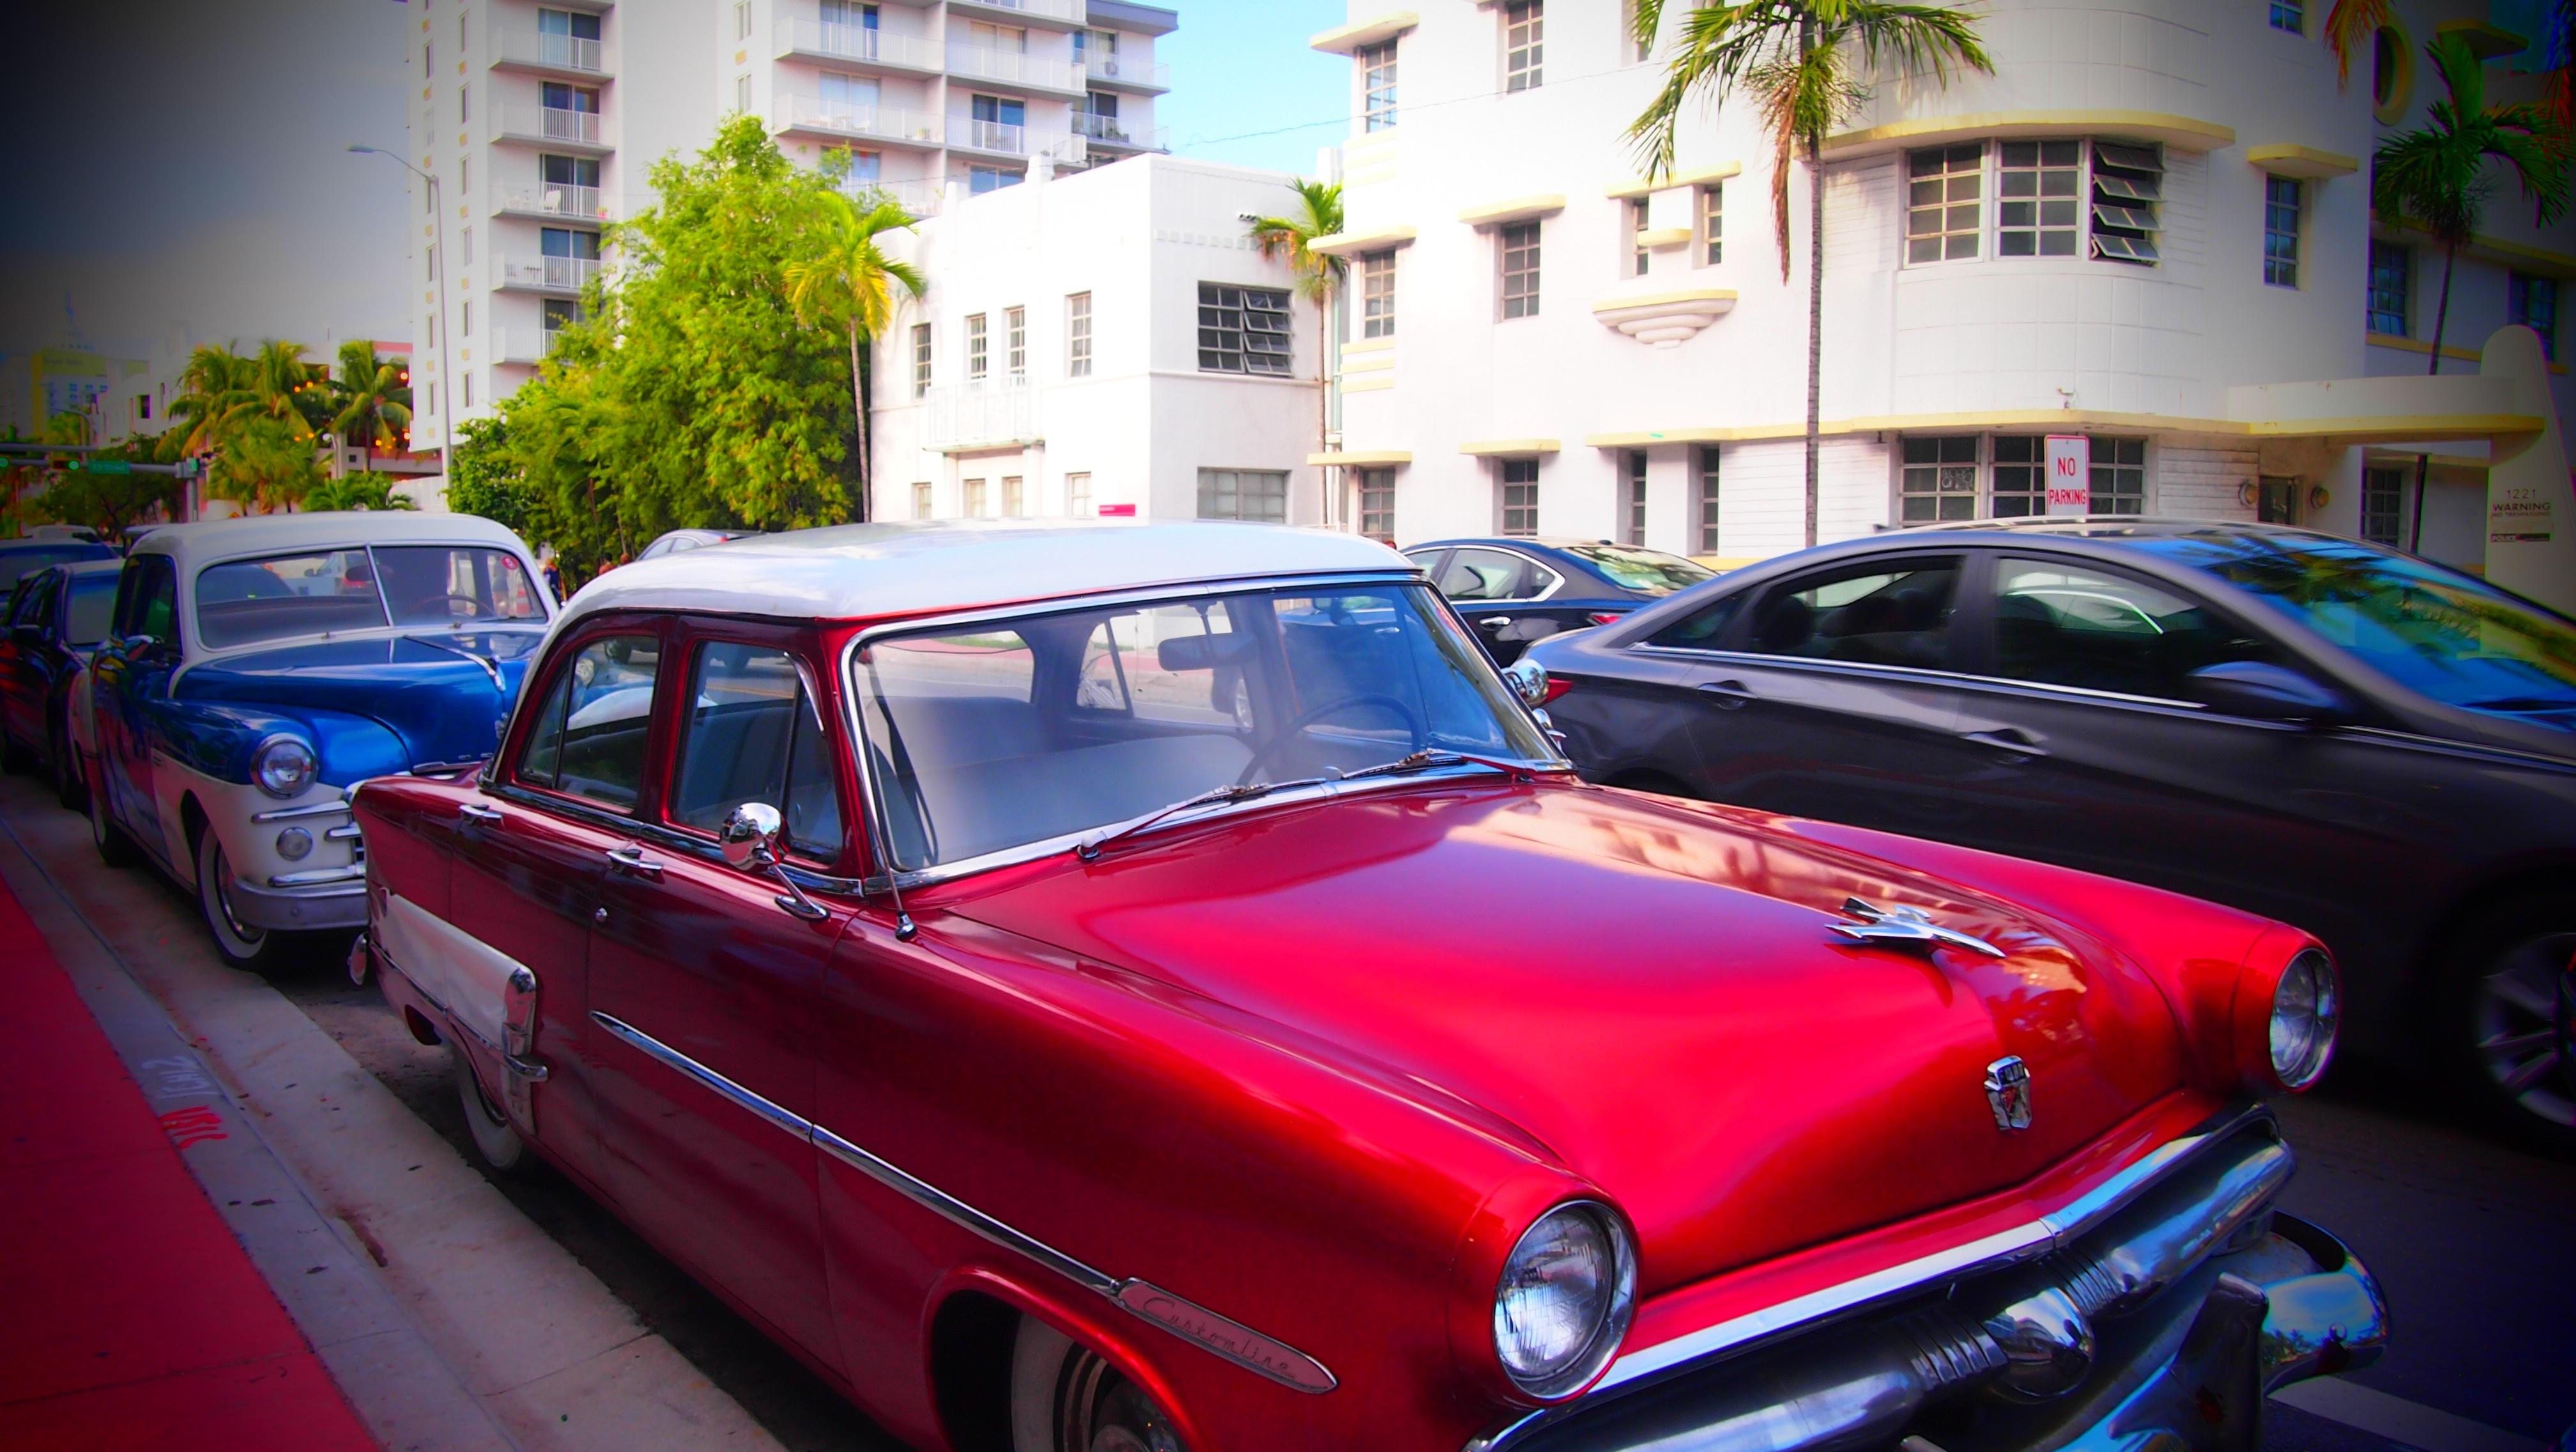 free images   usa  motor vehicle  vintage car  ford  sedan